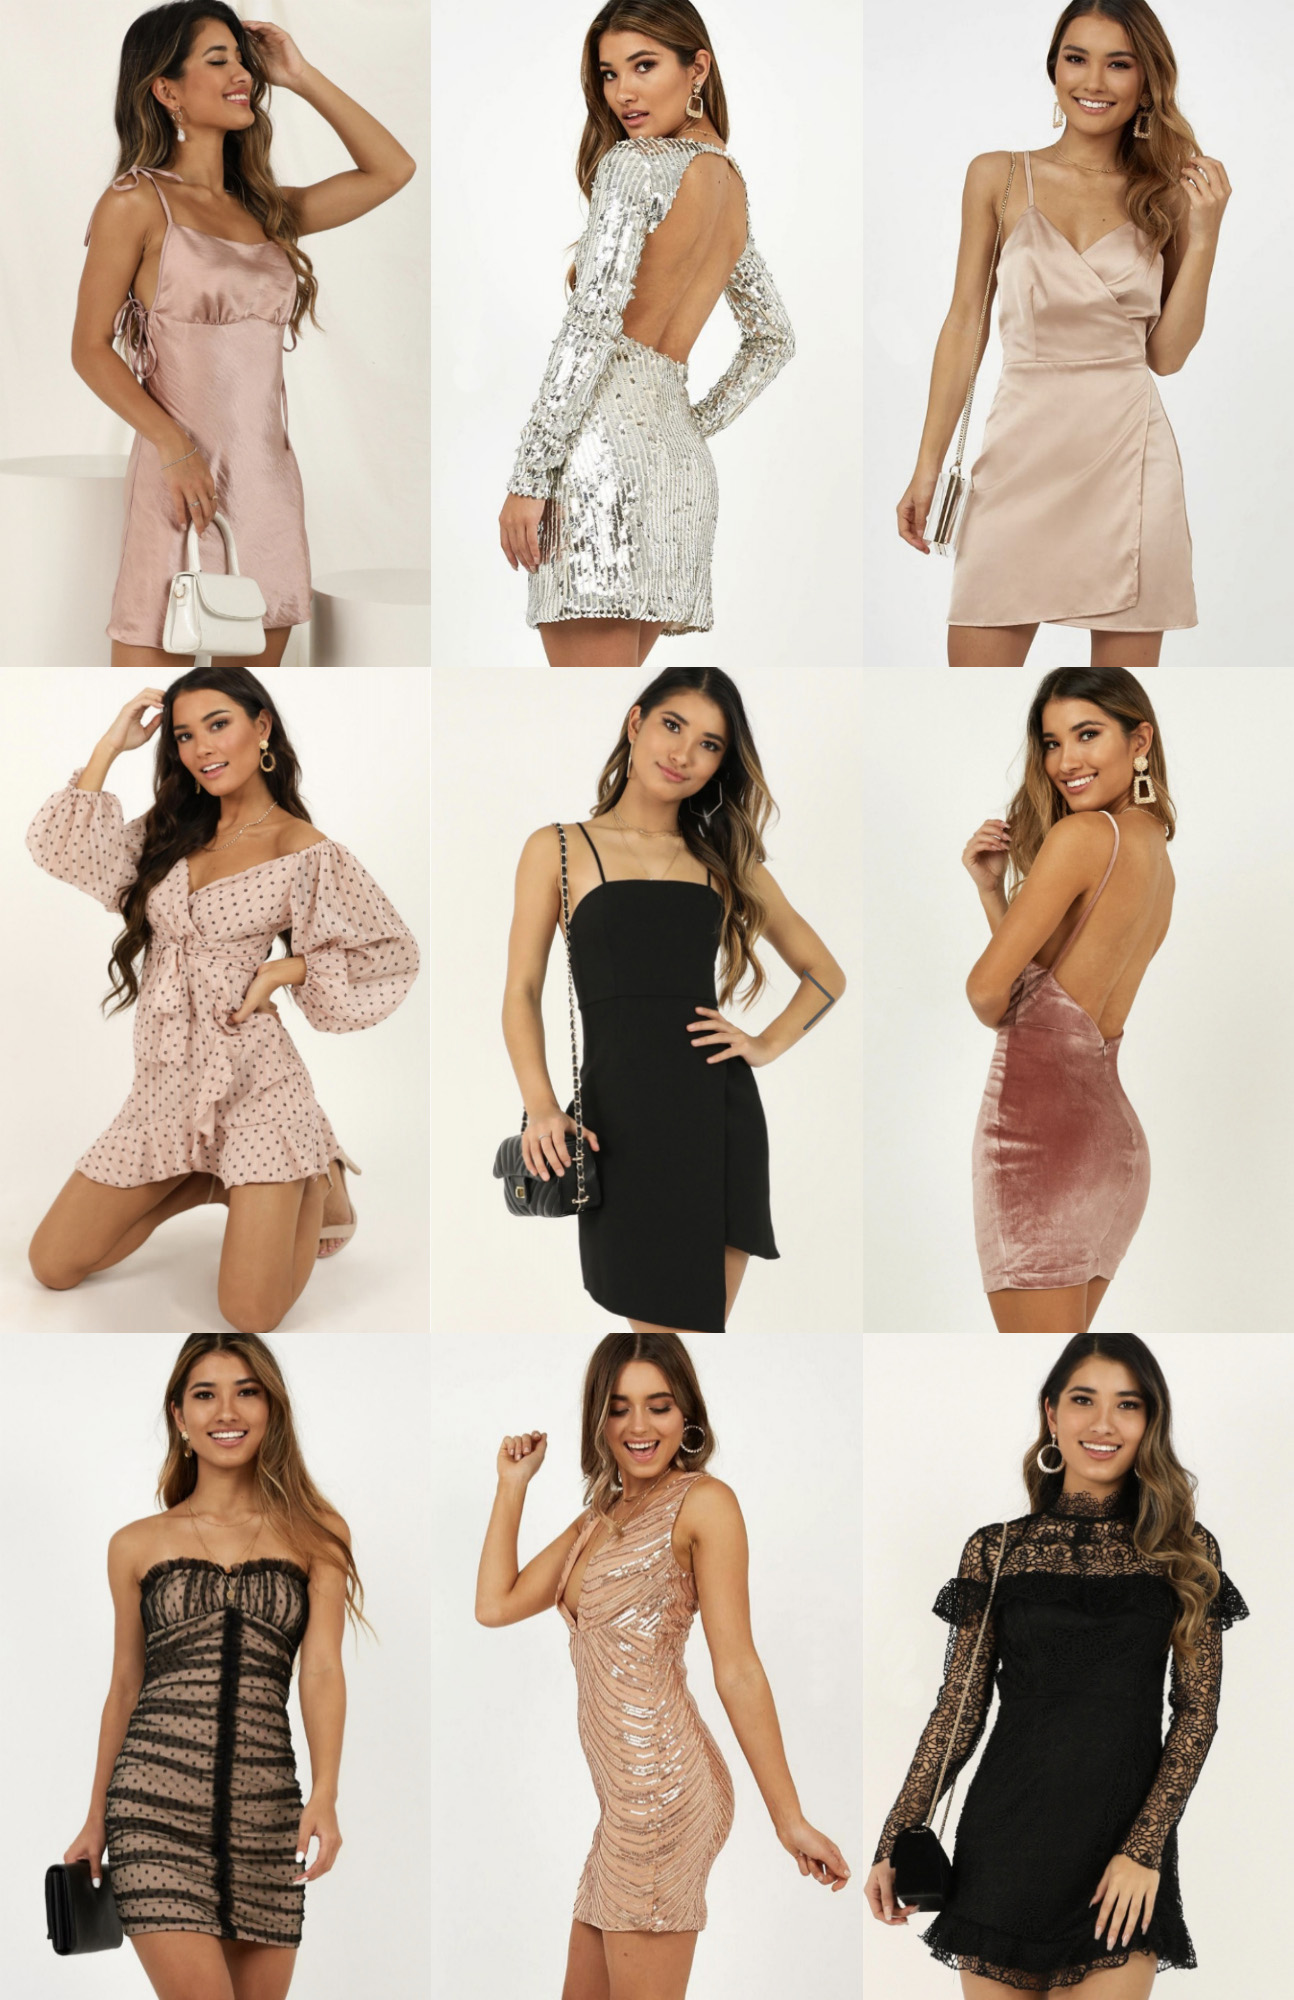 welcome party dresses off 18   medpharmres.com